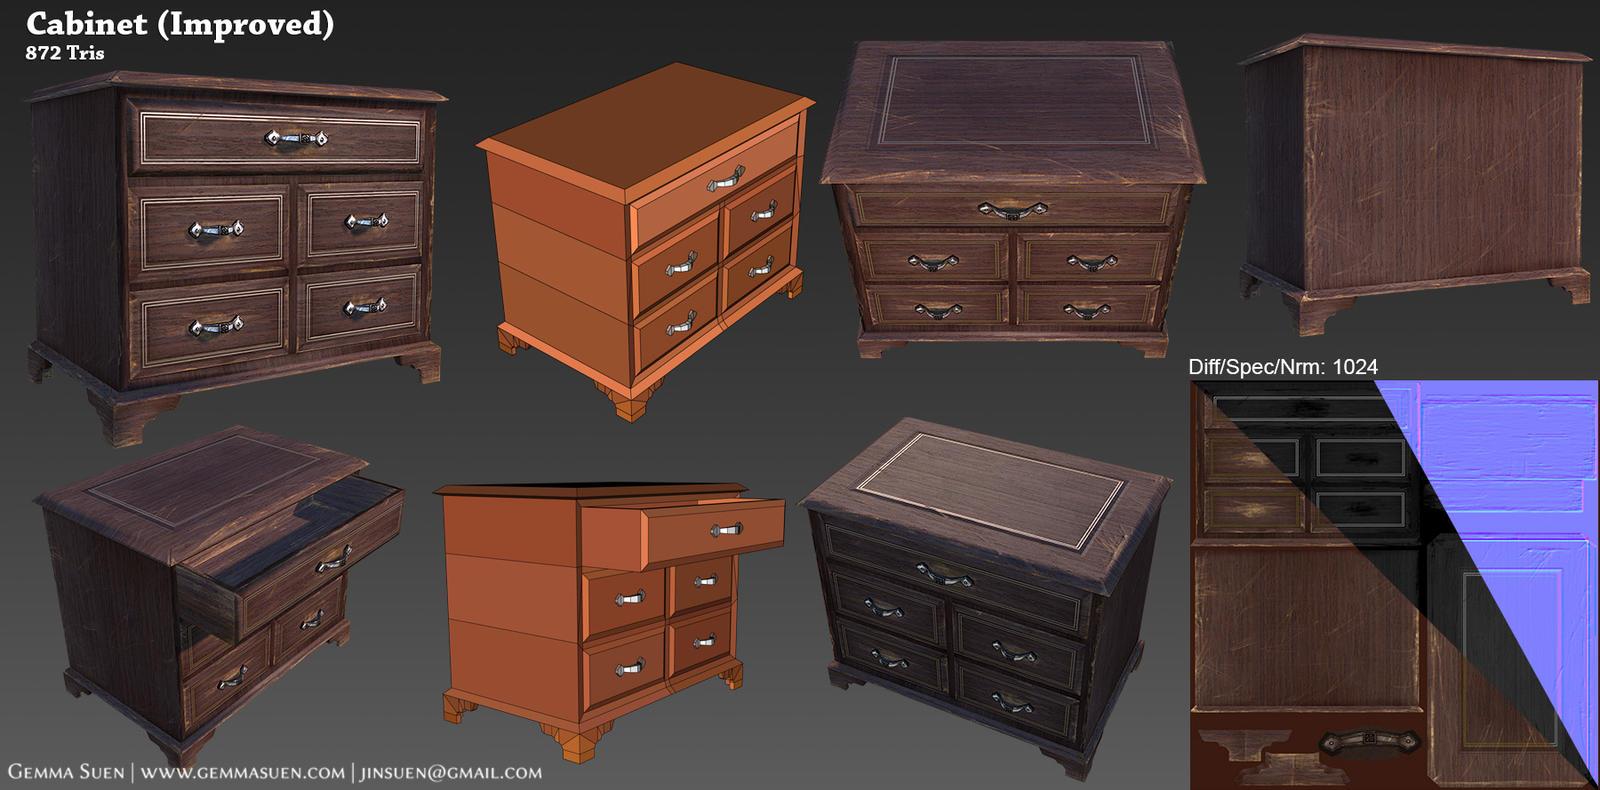 boring_cabinet_model_by_gemmasuen-d59x7lb.jpg